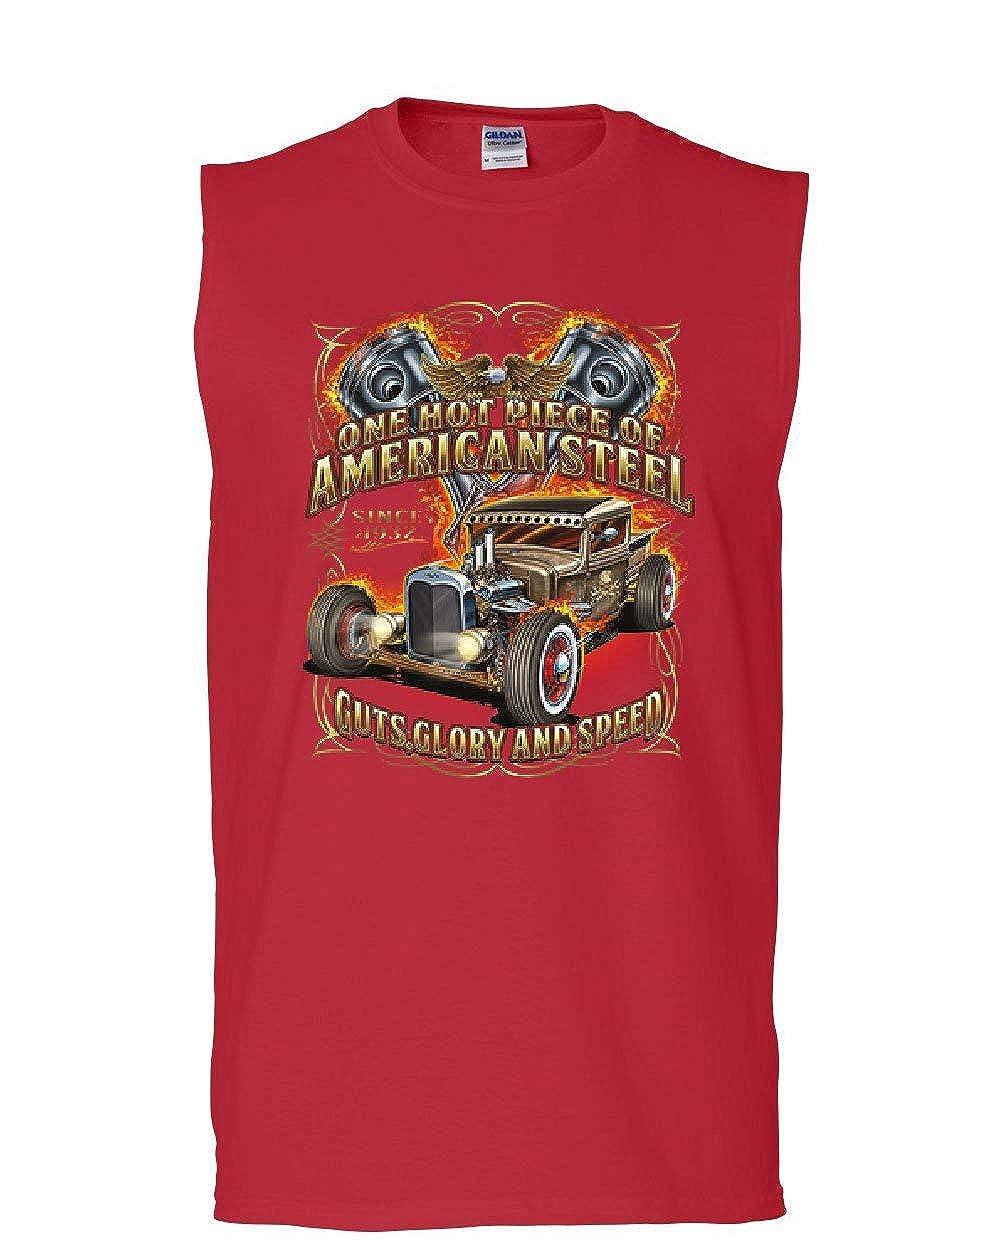 One Hot Piece of American Steel Muscle Shirt Hot Rod Guts Glory Speed Sleeveless